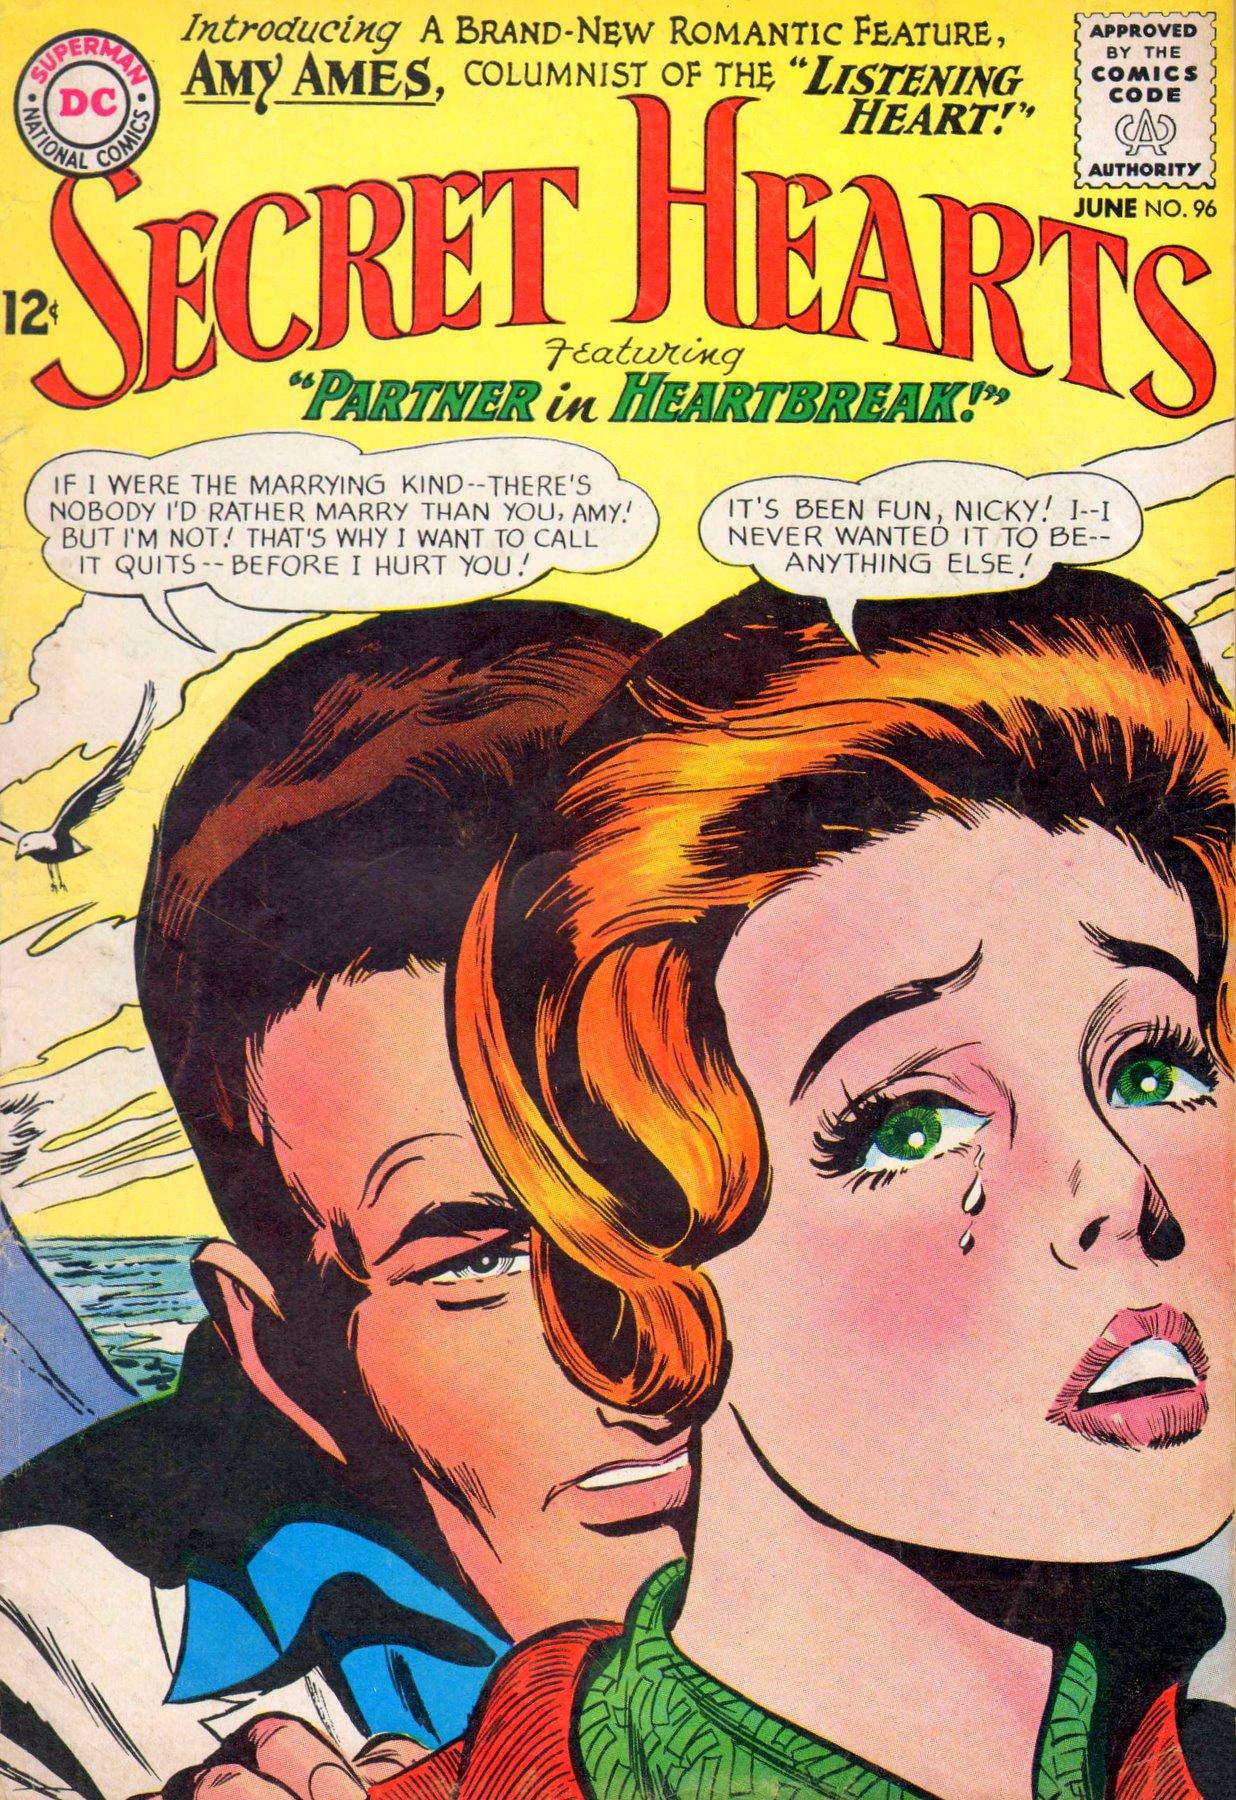 Read online Secret Hearts comic -  Issue #96 - 1